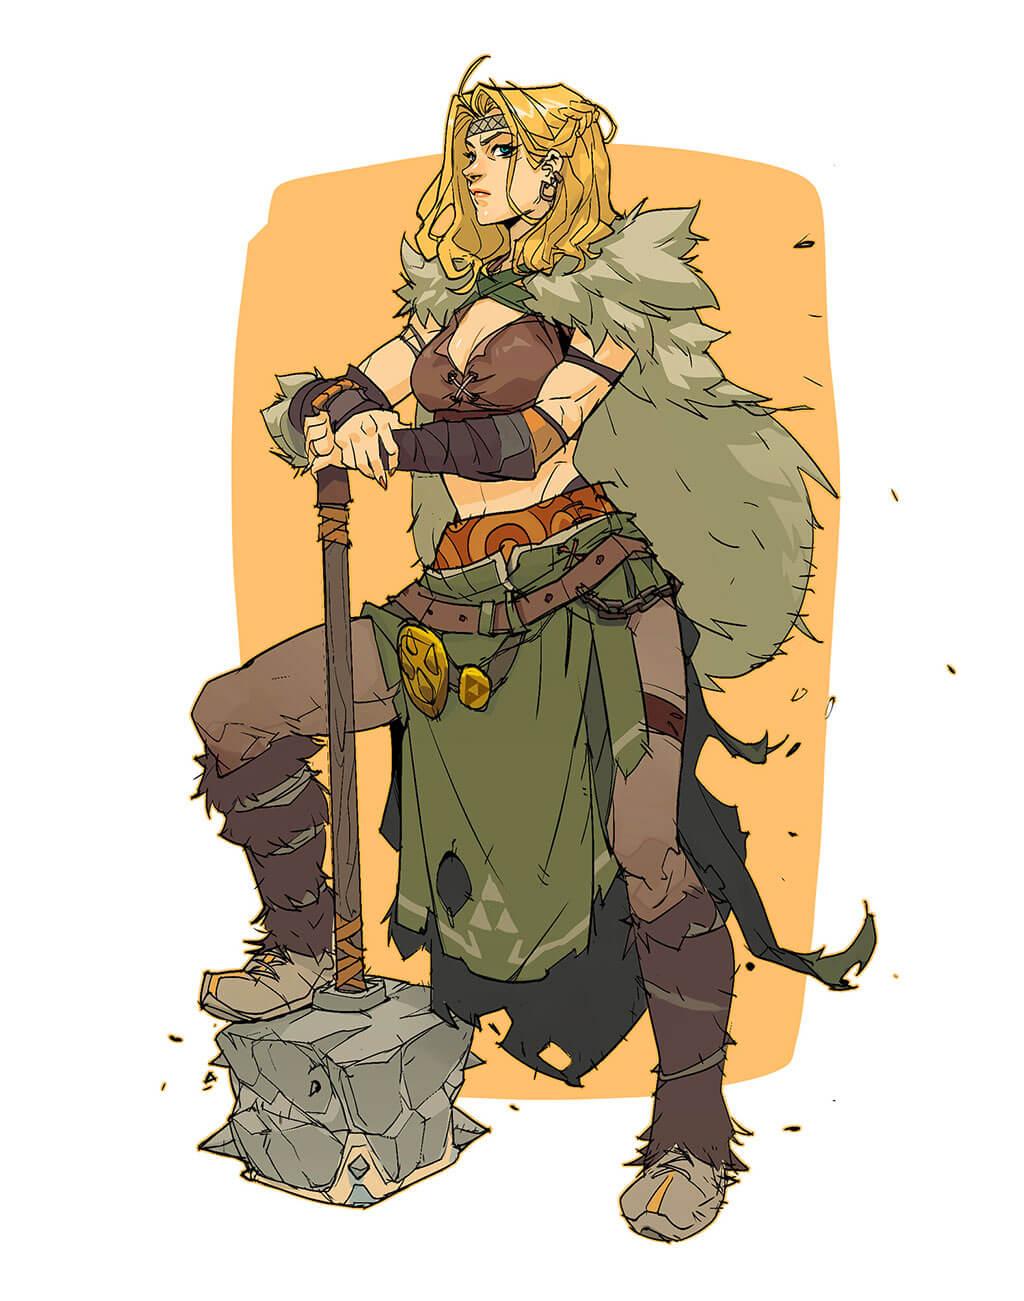 Zelda Fan Art by Hicham Habchi